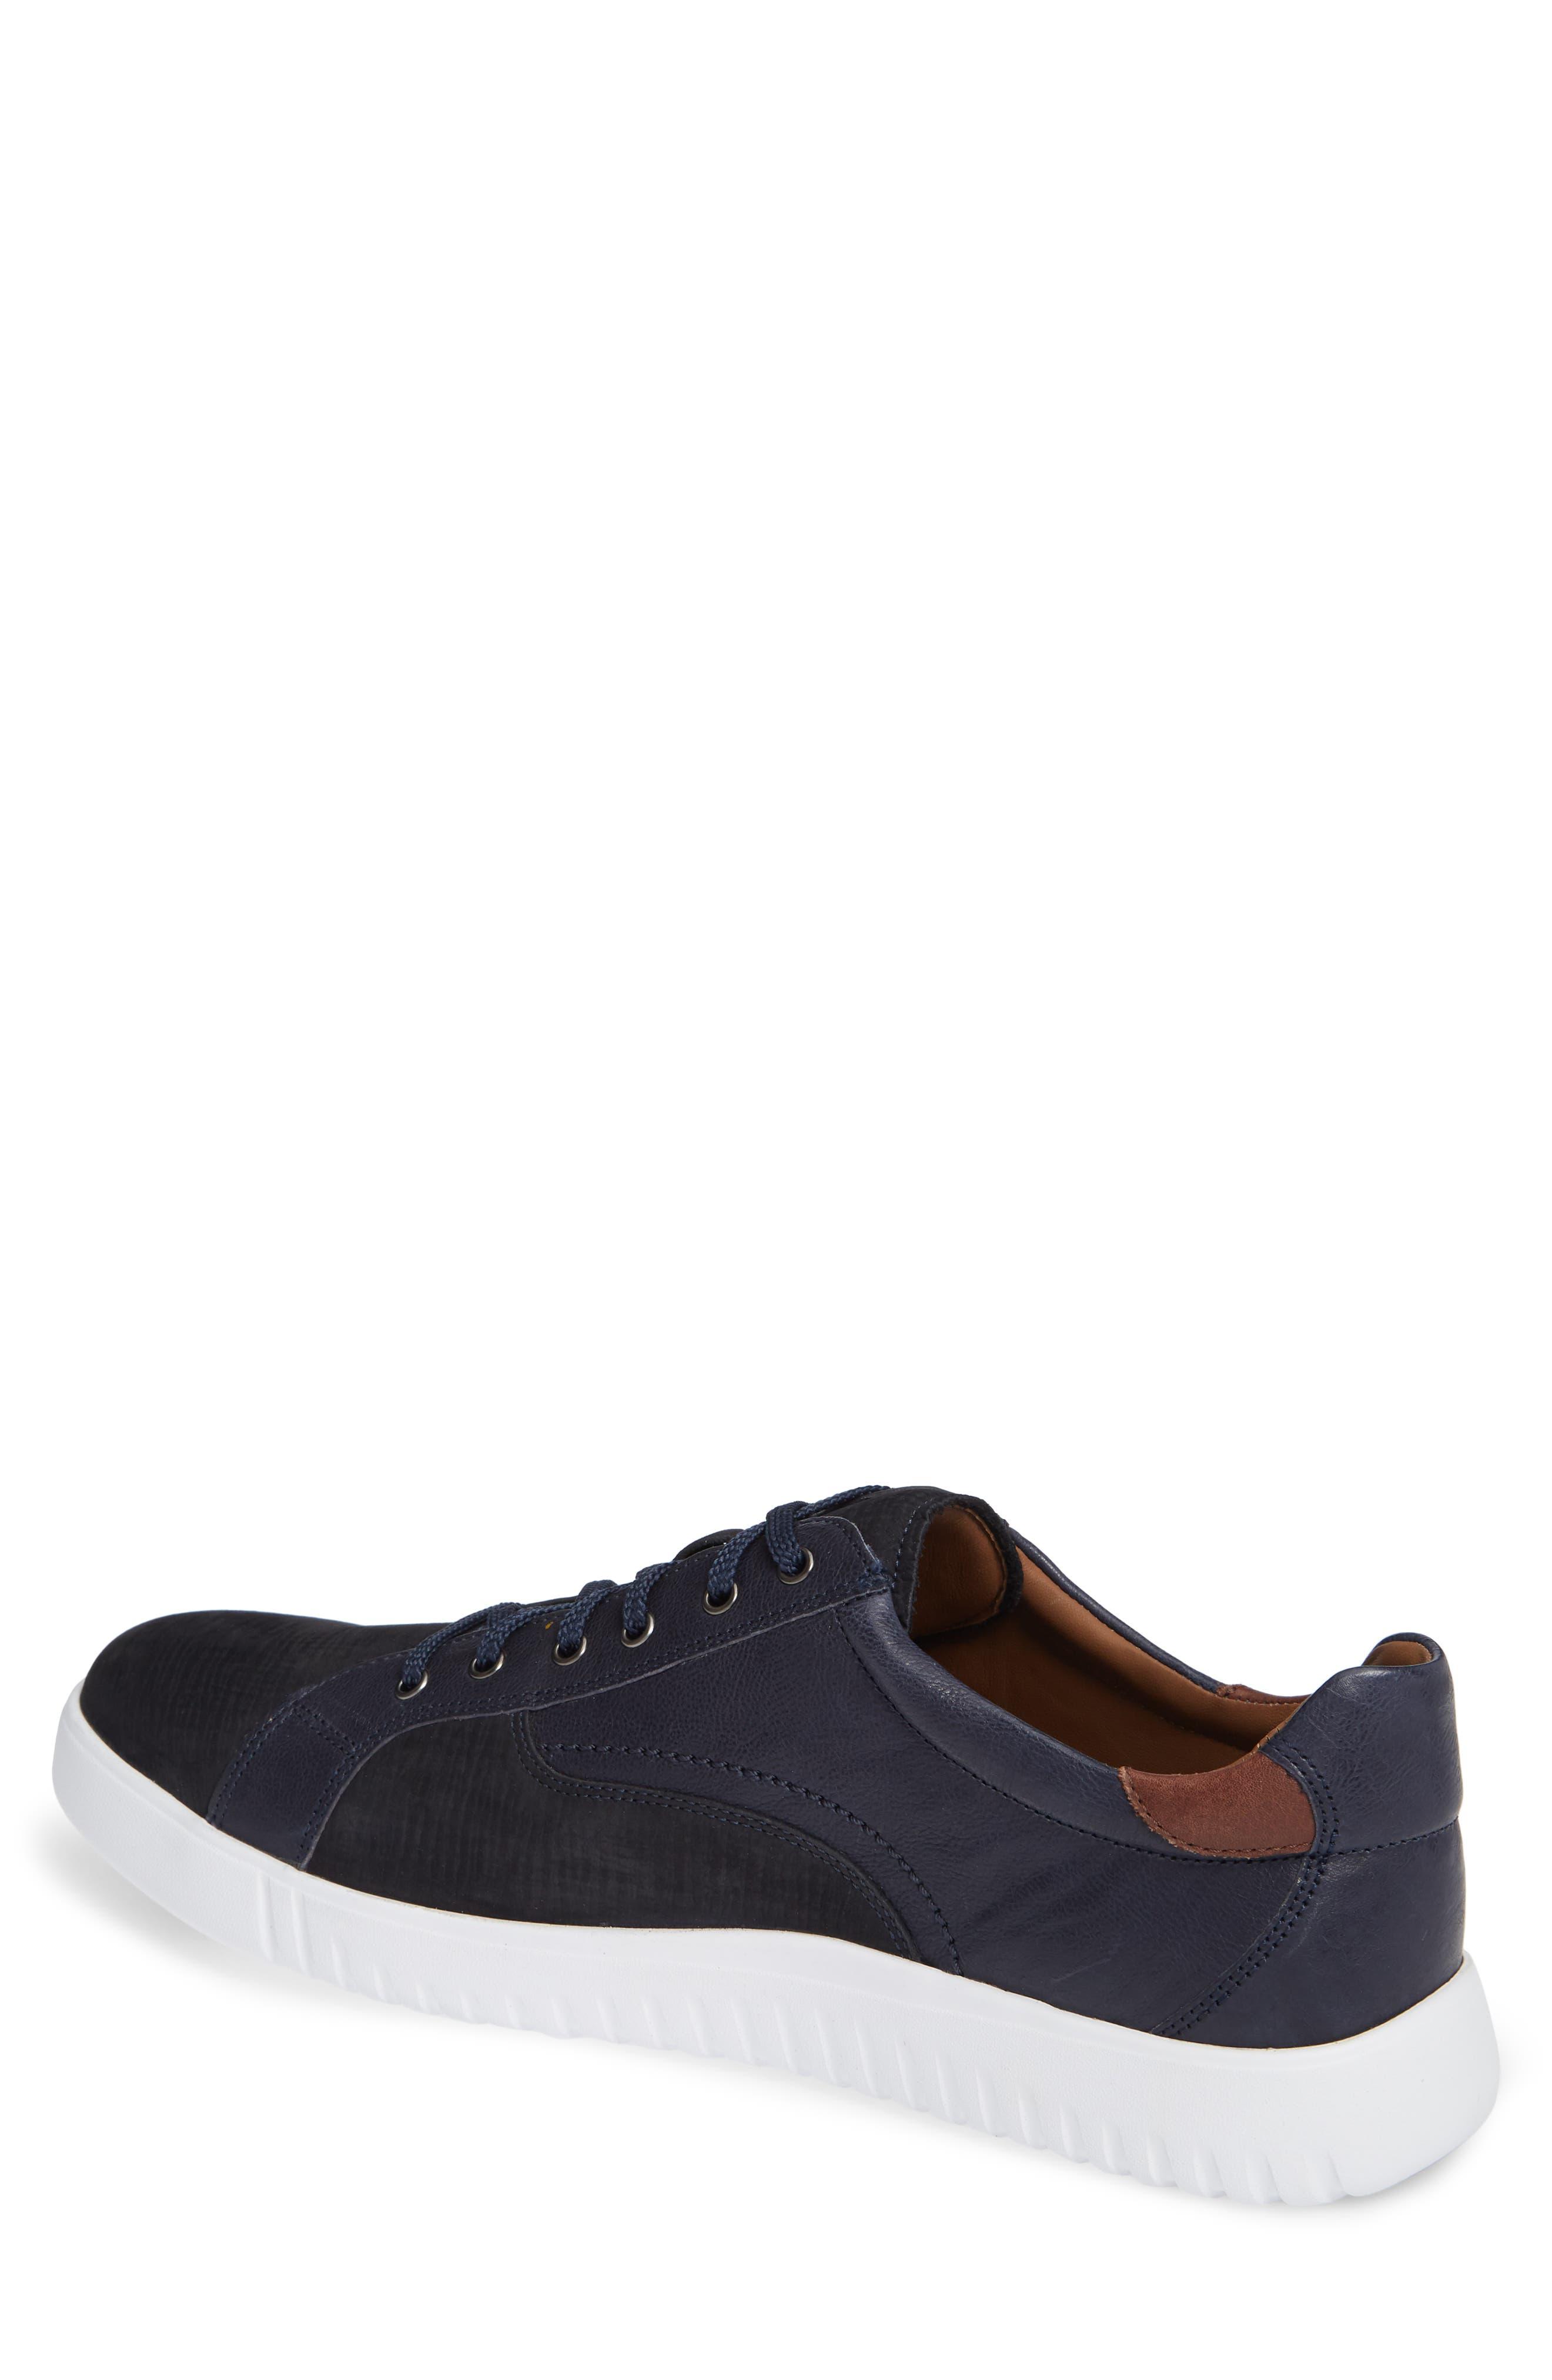 JOHNSTON & MURPHY, McFarland Sneaker, Alternate thumbnail 2, color, NAVY NUBUCK